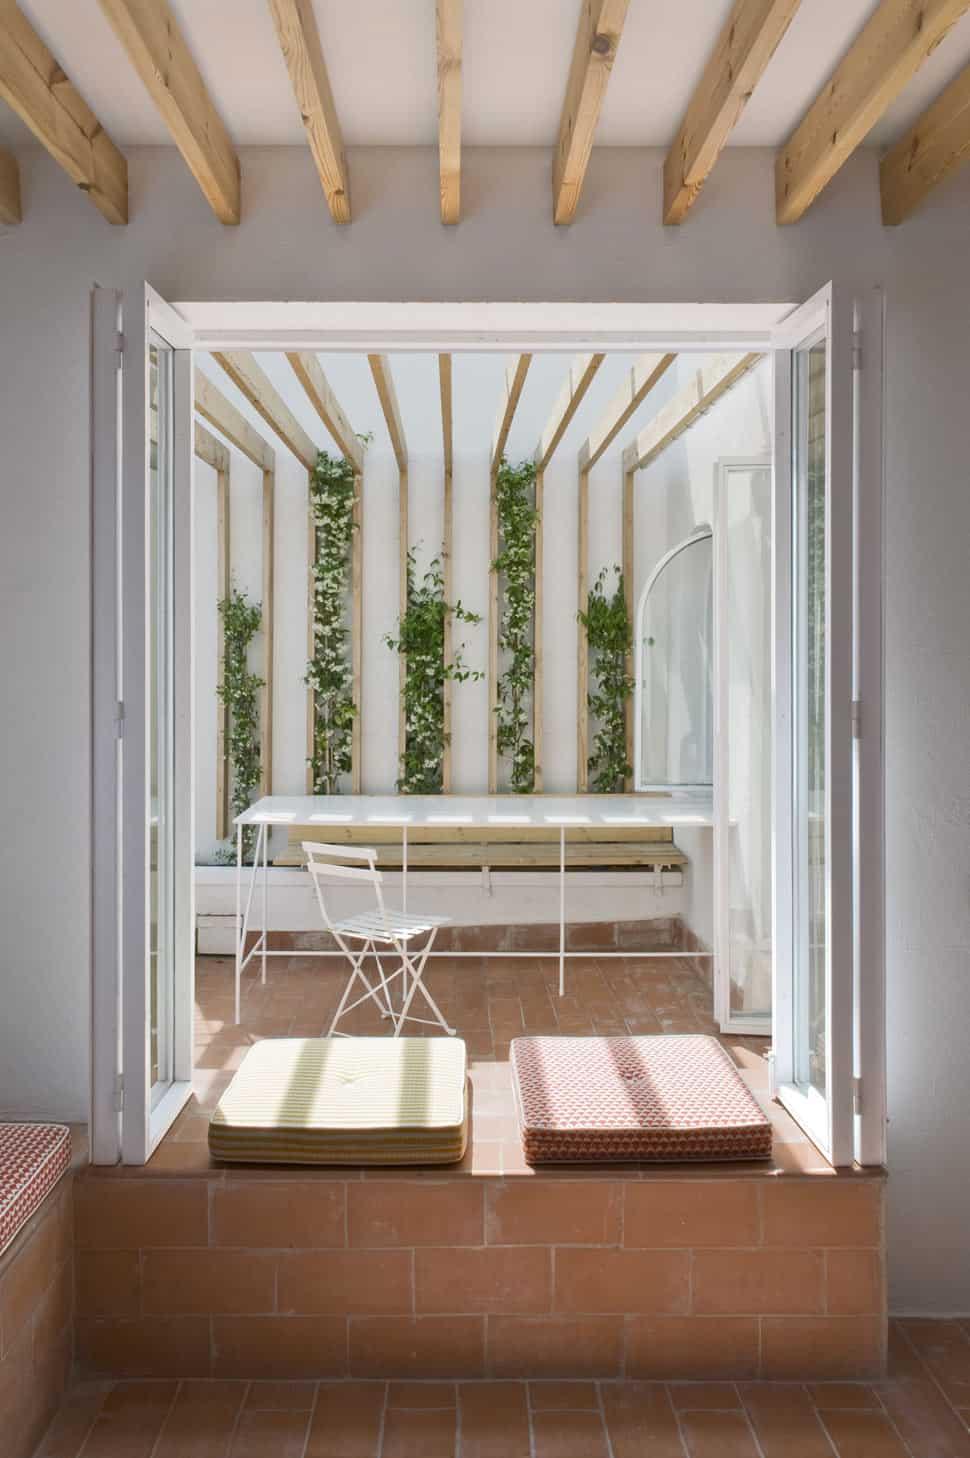 Cozy interior brick sitting area brings the outdoor - Cerrar galeria ...